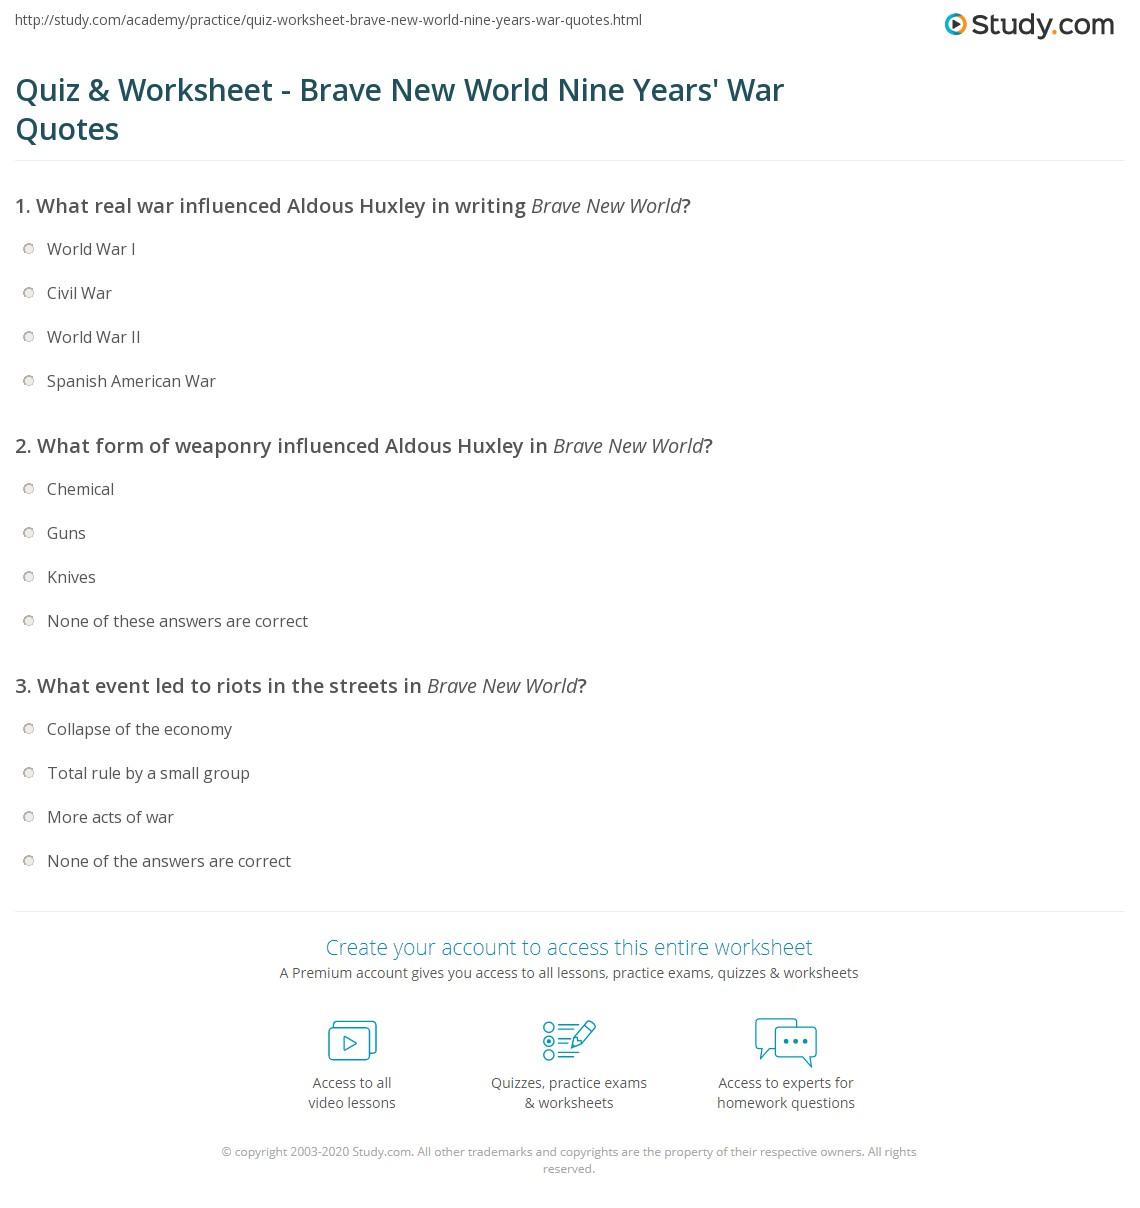 quiz worksheet brave new world nine years 39 war quotes. Black Bedroom Furniture Sets. Home Design Ideas